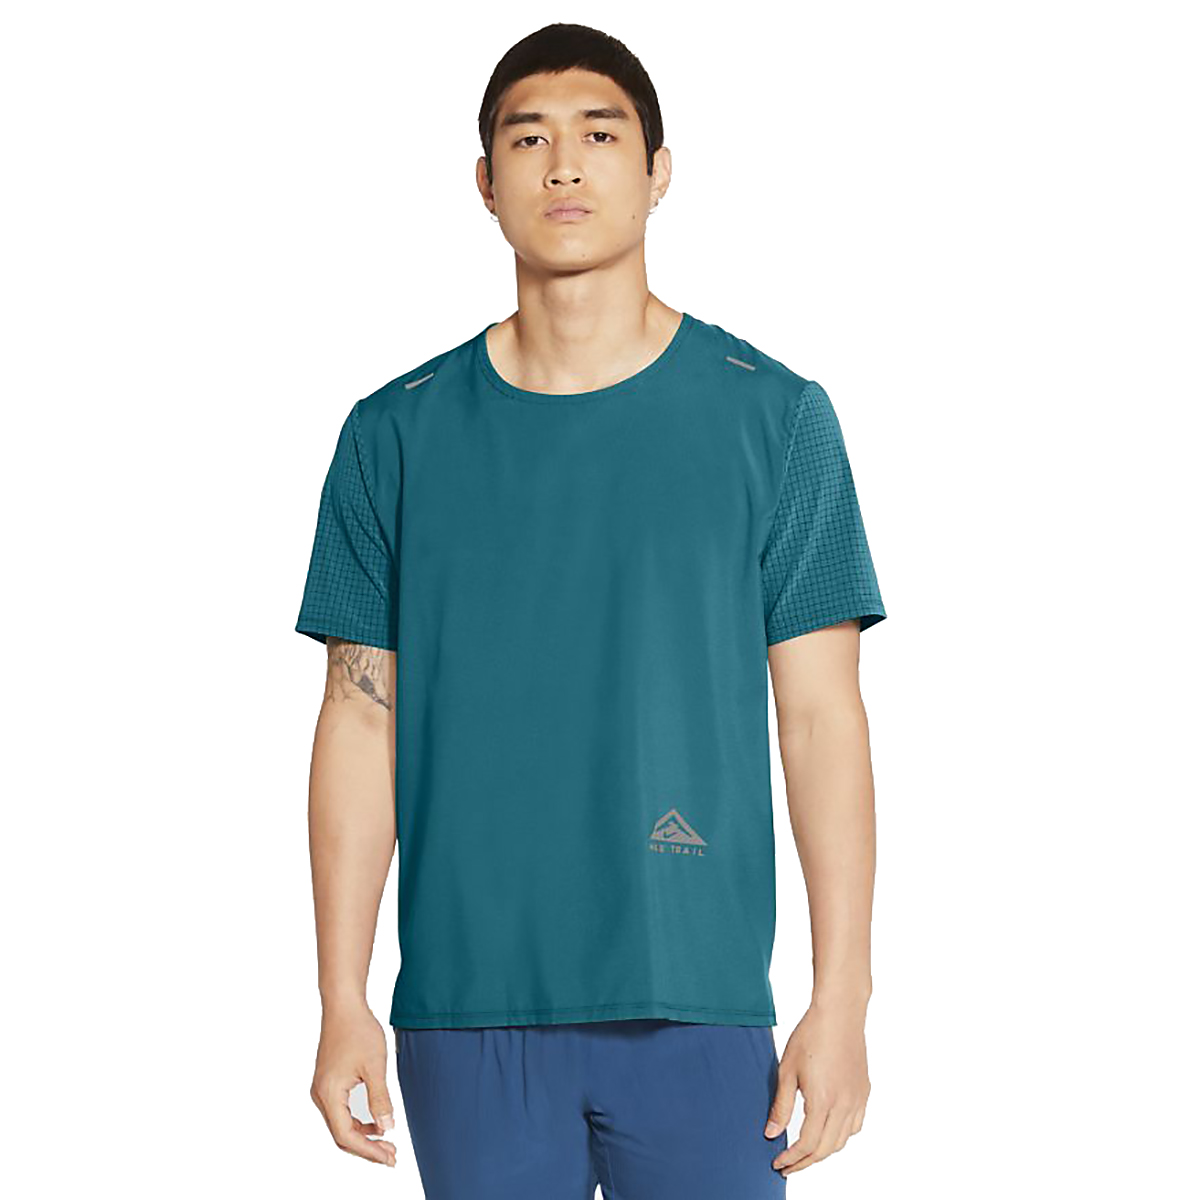 Men's Nike Dri-FIT Rise 365 Short-Sleeve Trail Running Top, , large, image 1